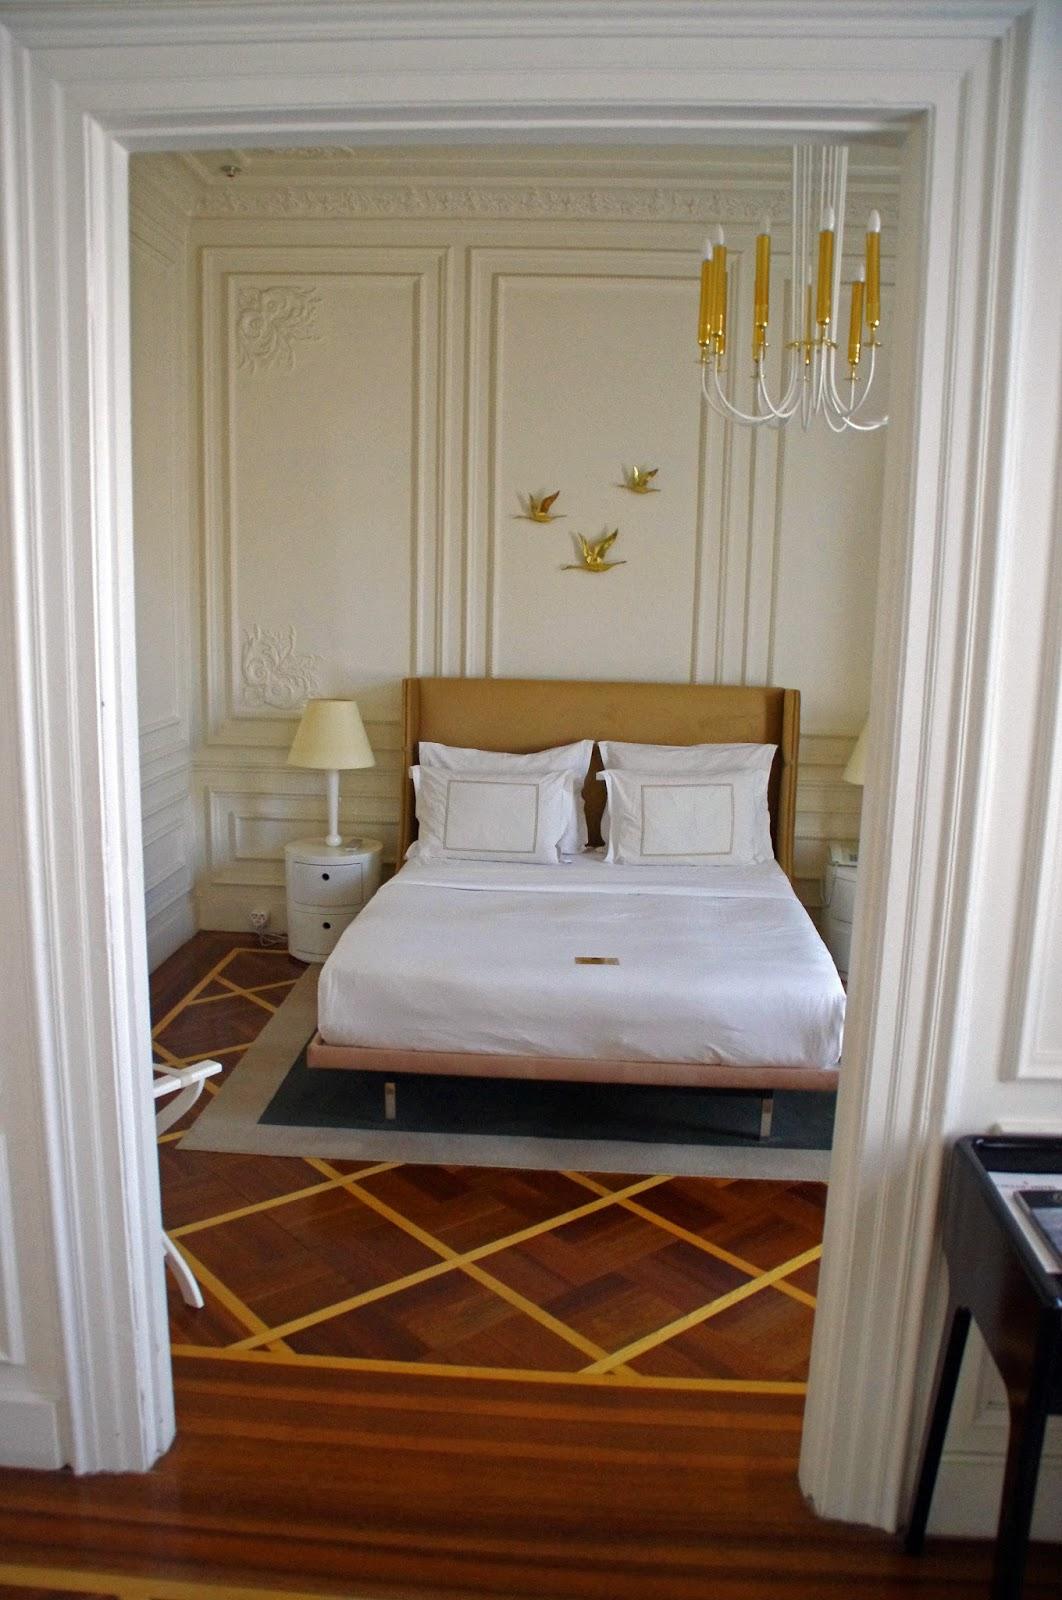 House Hotel Galatasaray Bedroom